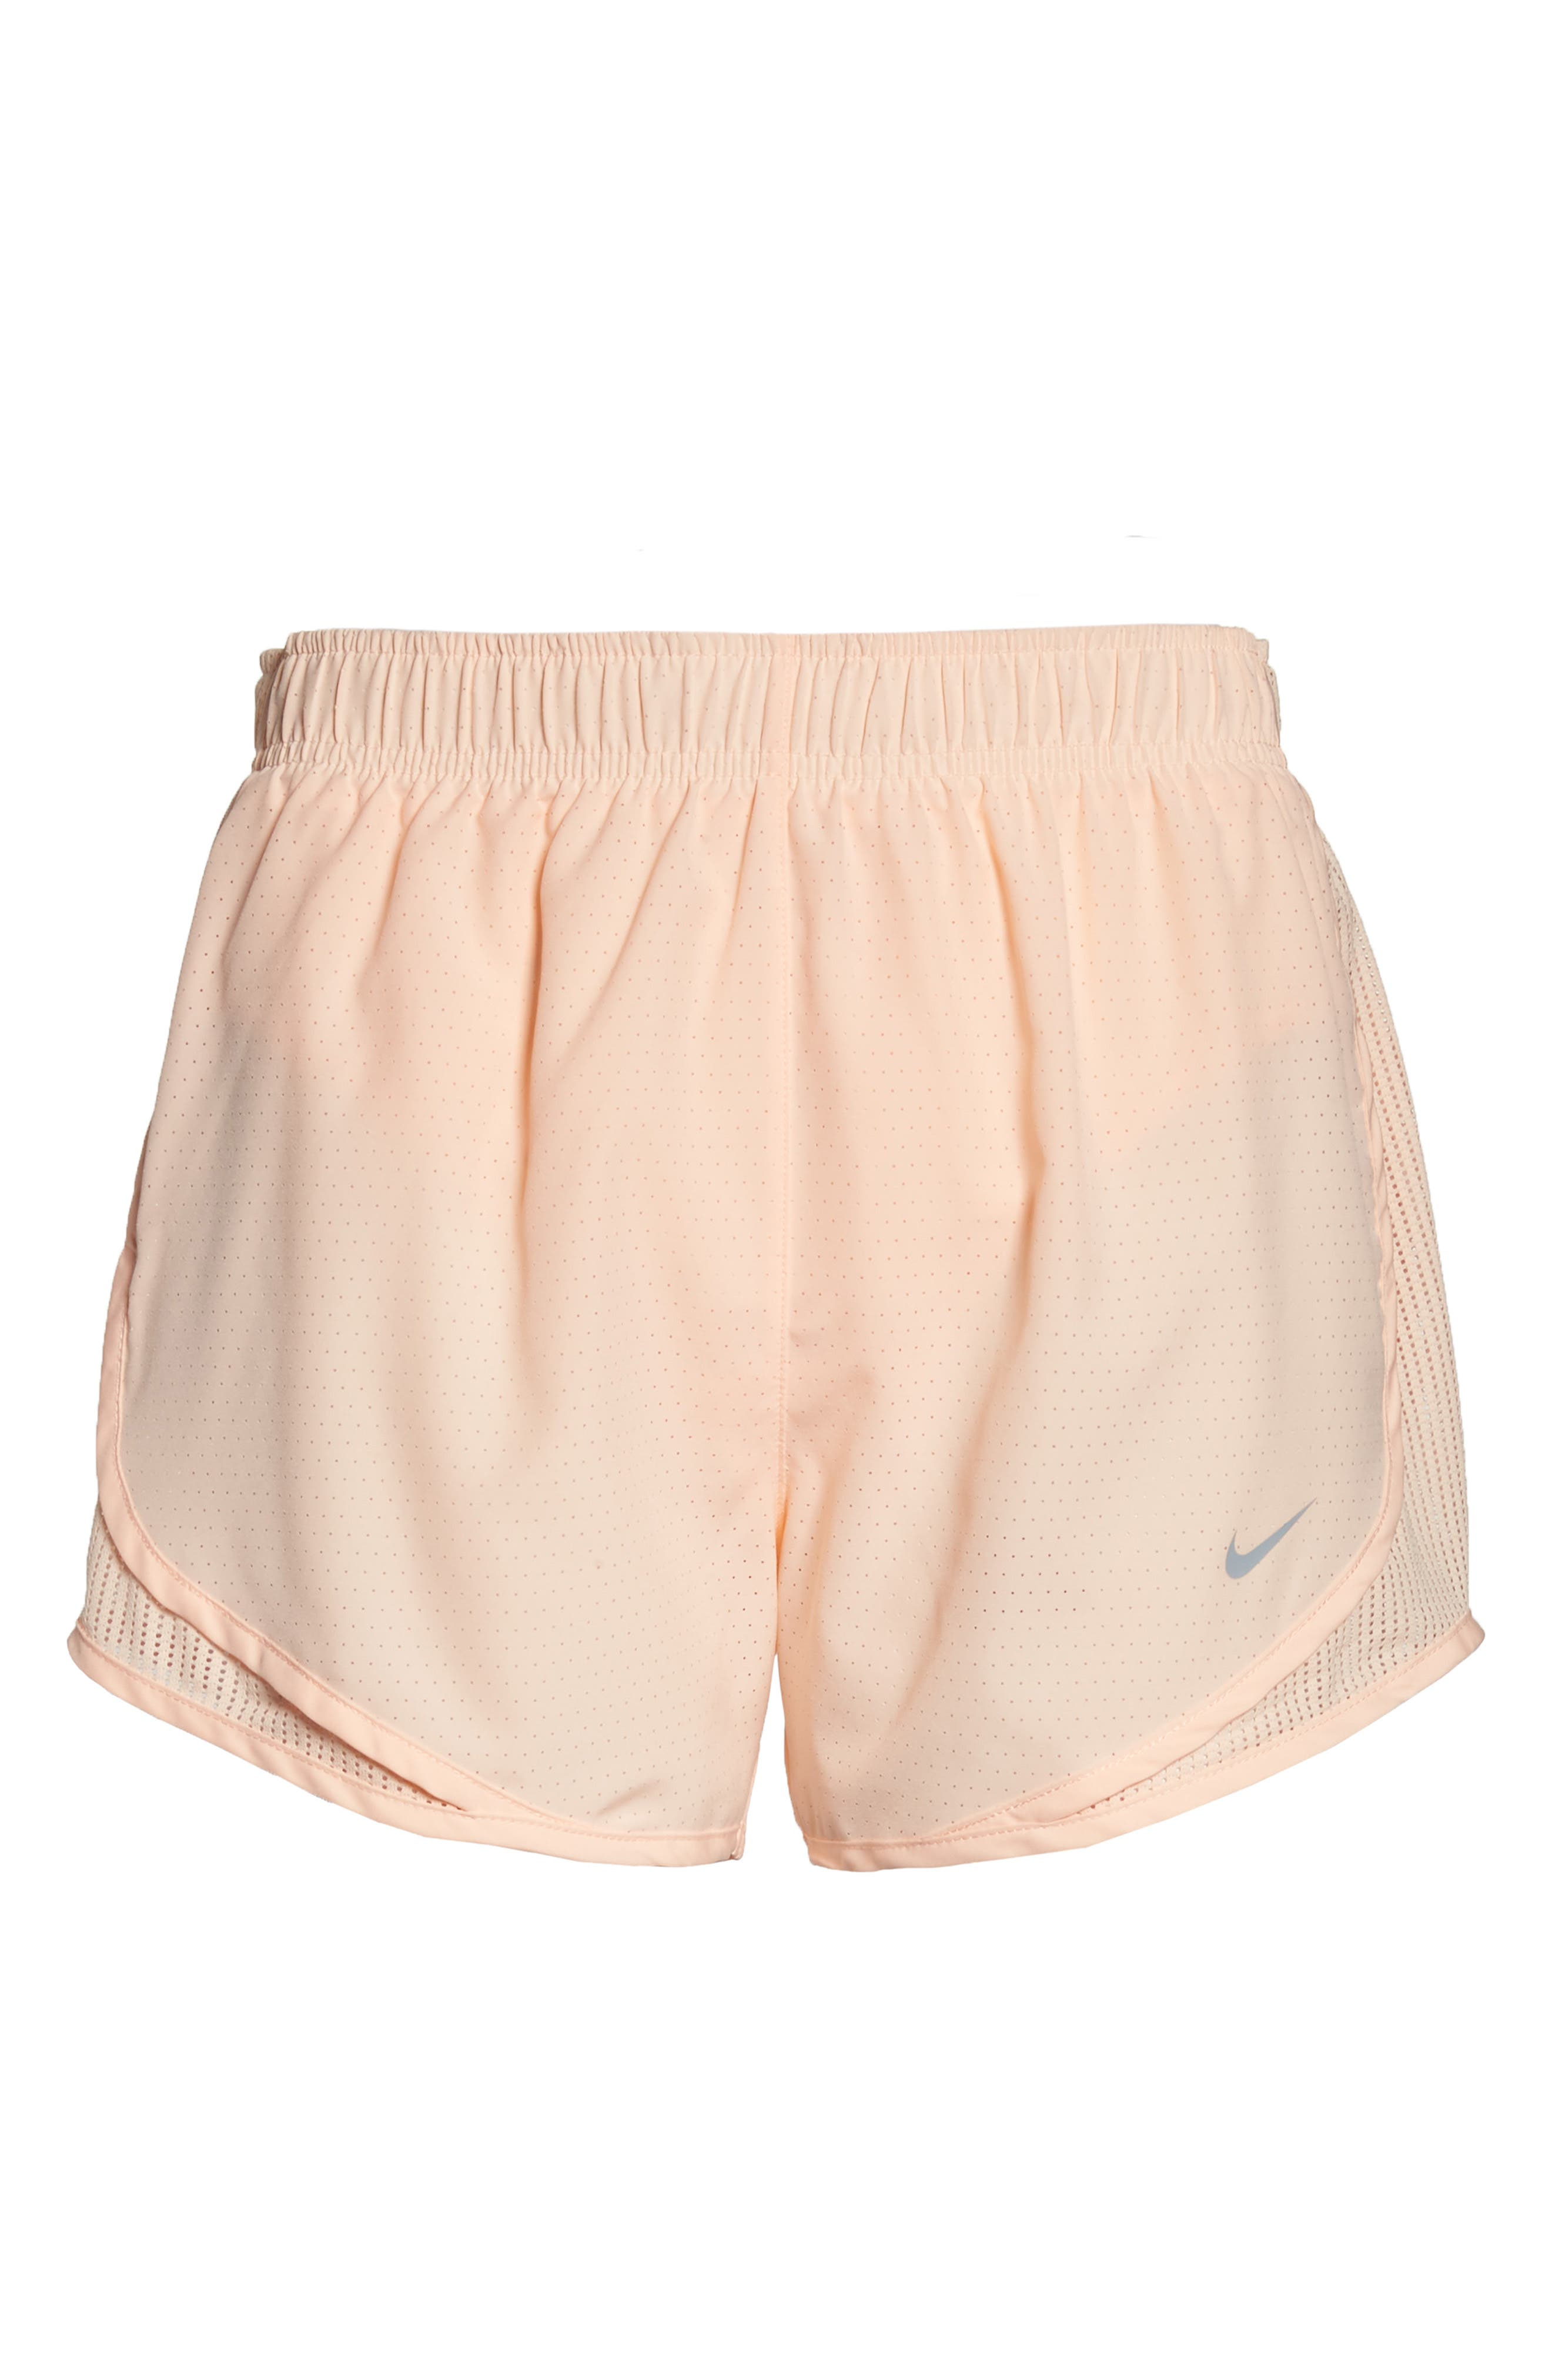 Dry Tempo Running Shorts,                             Alternate thumbnail 7, color,                             614